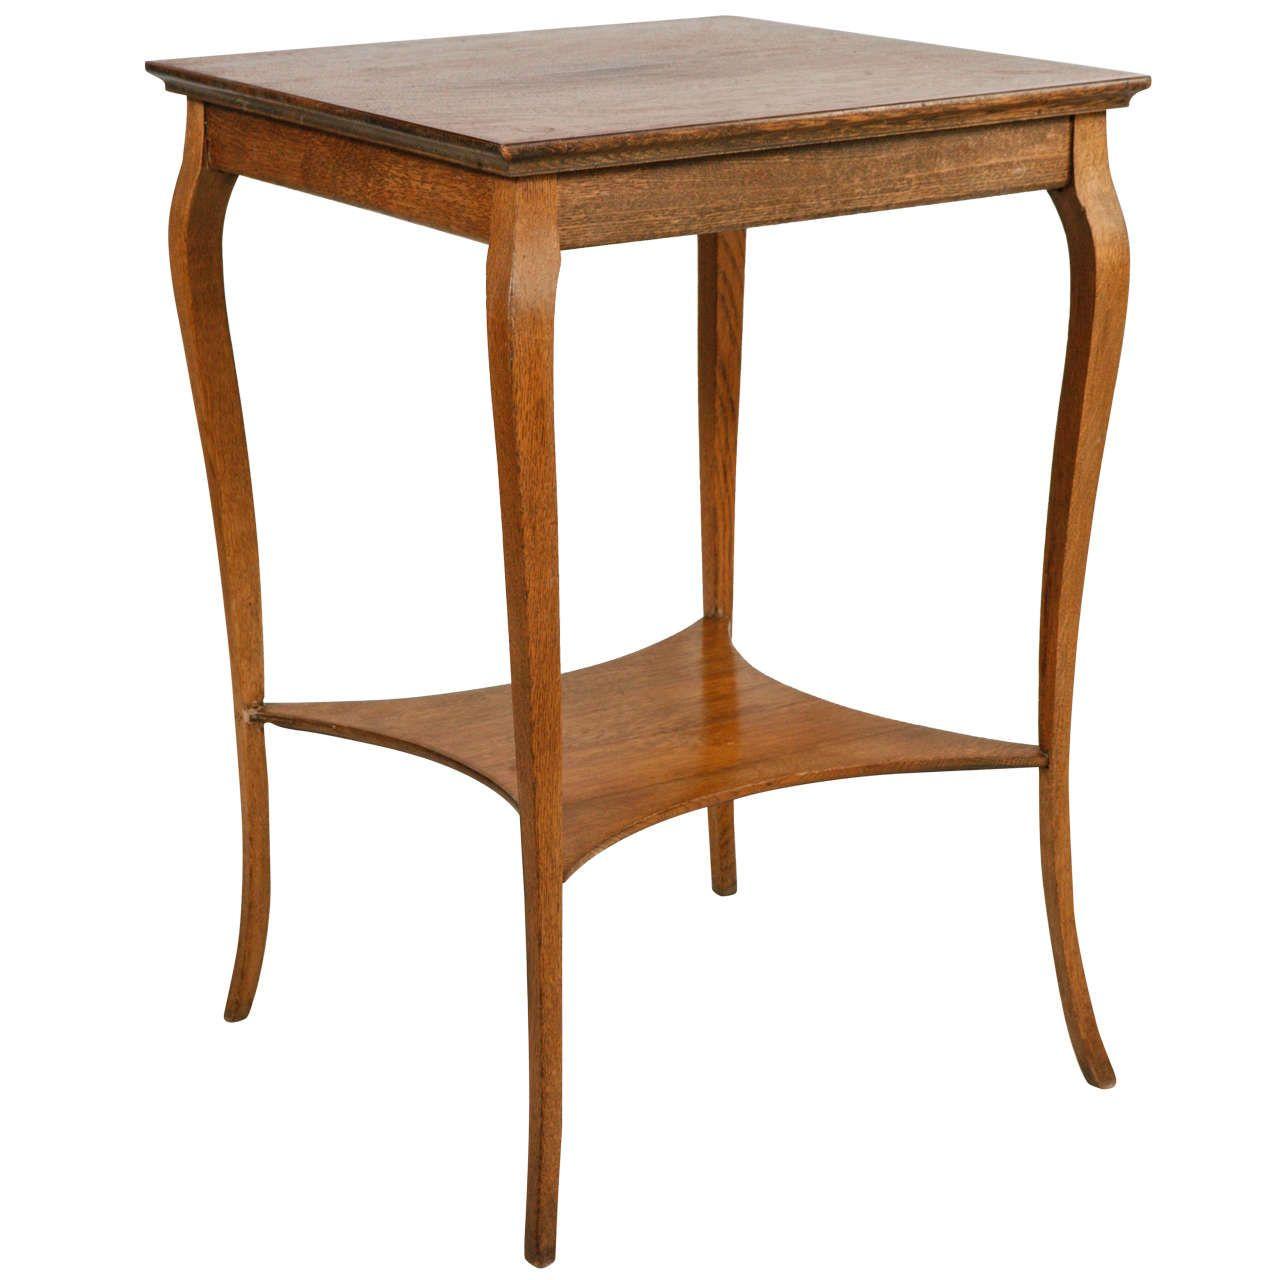 designer fashion 7e910 21870 Tall Curved Leg Oak Side Table | Home | Table, Modern side ...